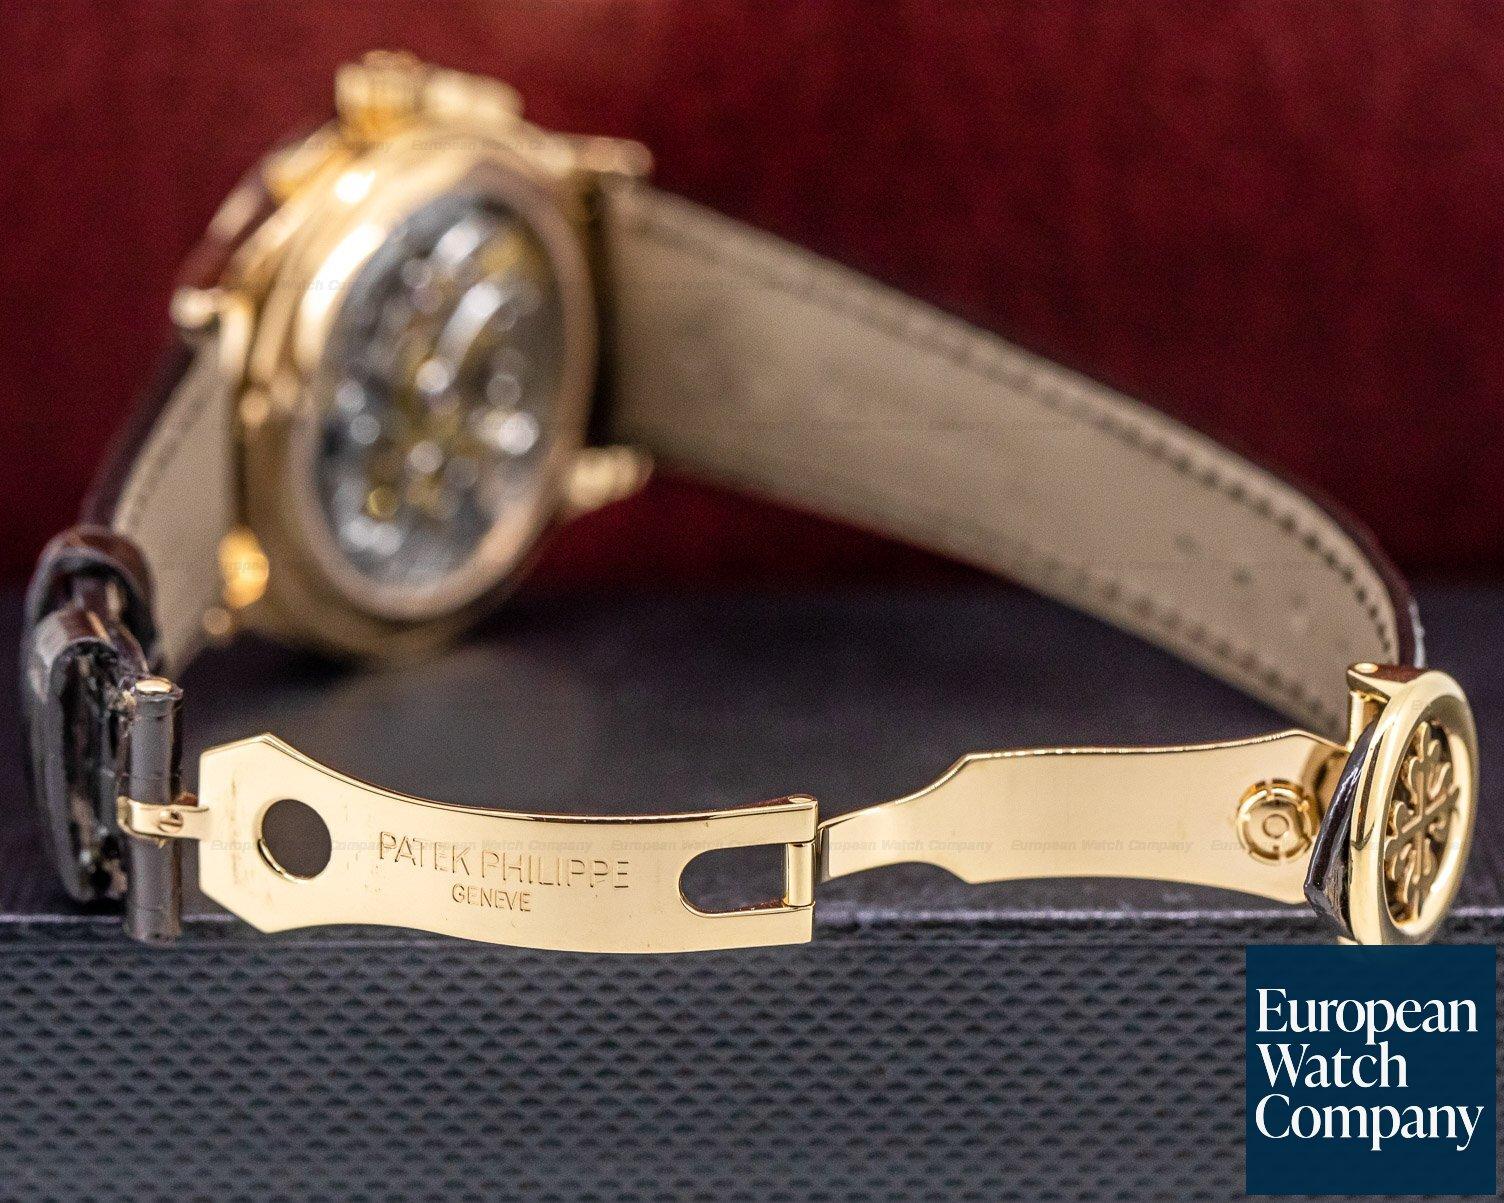 Patek Philippe 5170R-001 Chronograph 18K Rose Gold Silver Dial